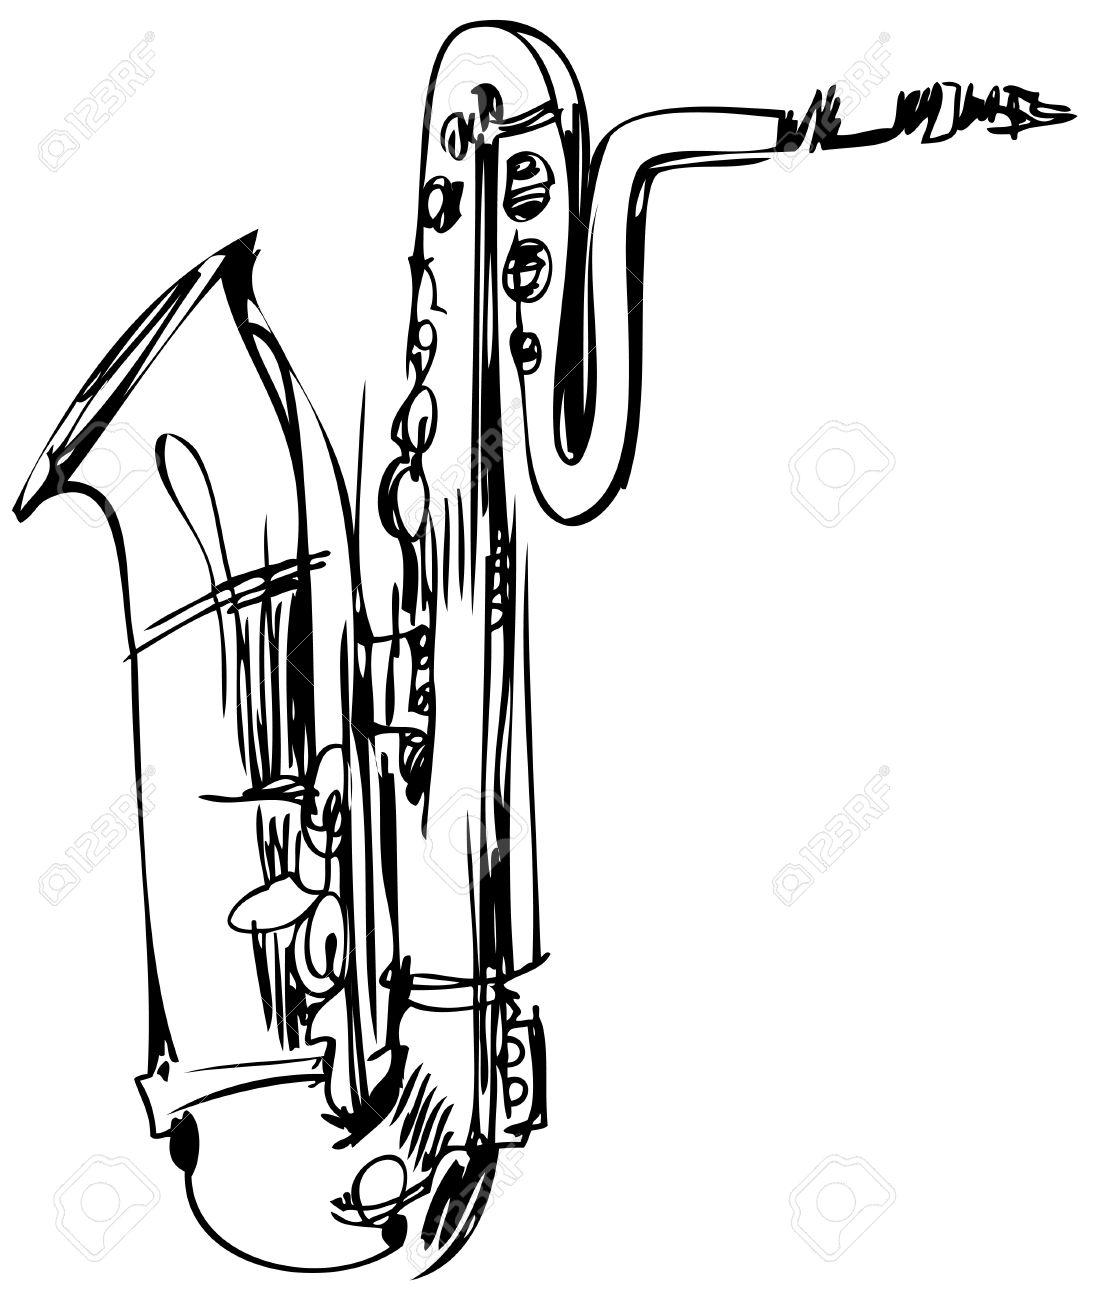 Bari Sax Drawing